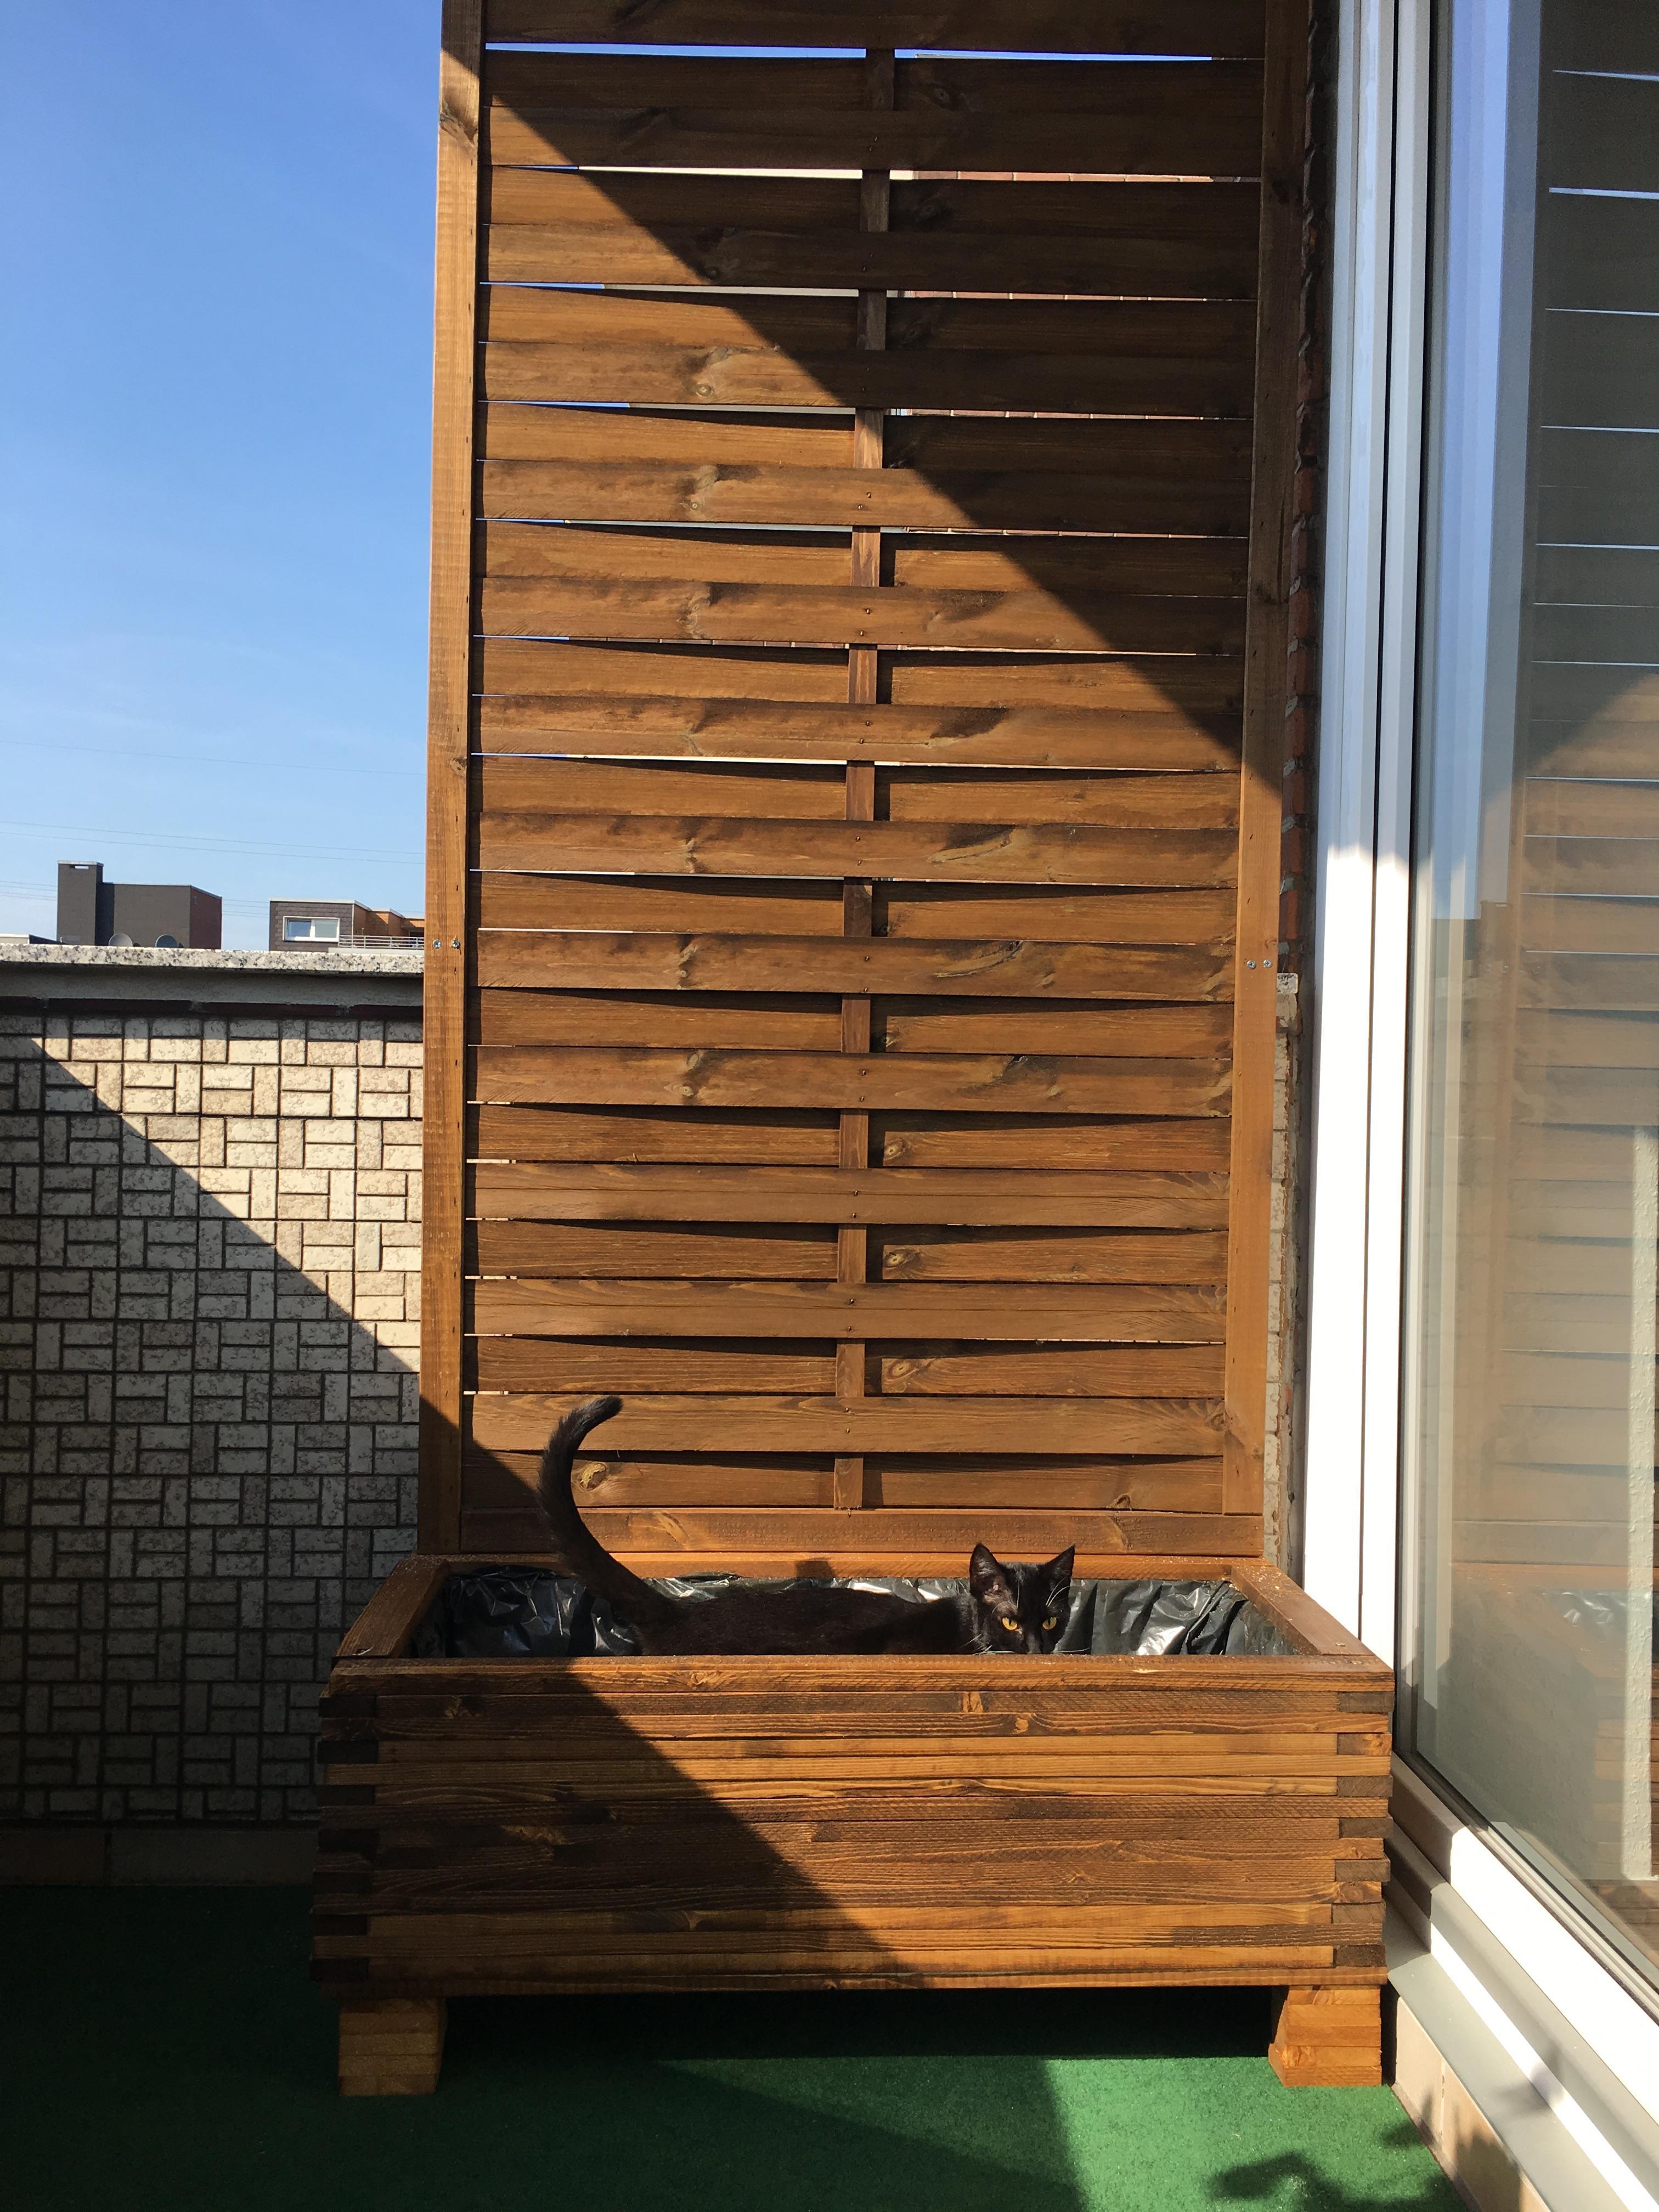 Balkon Sichtschutz Blumenkubel Diy Anleitung Idatschka De